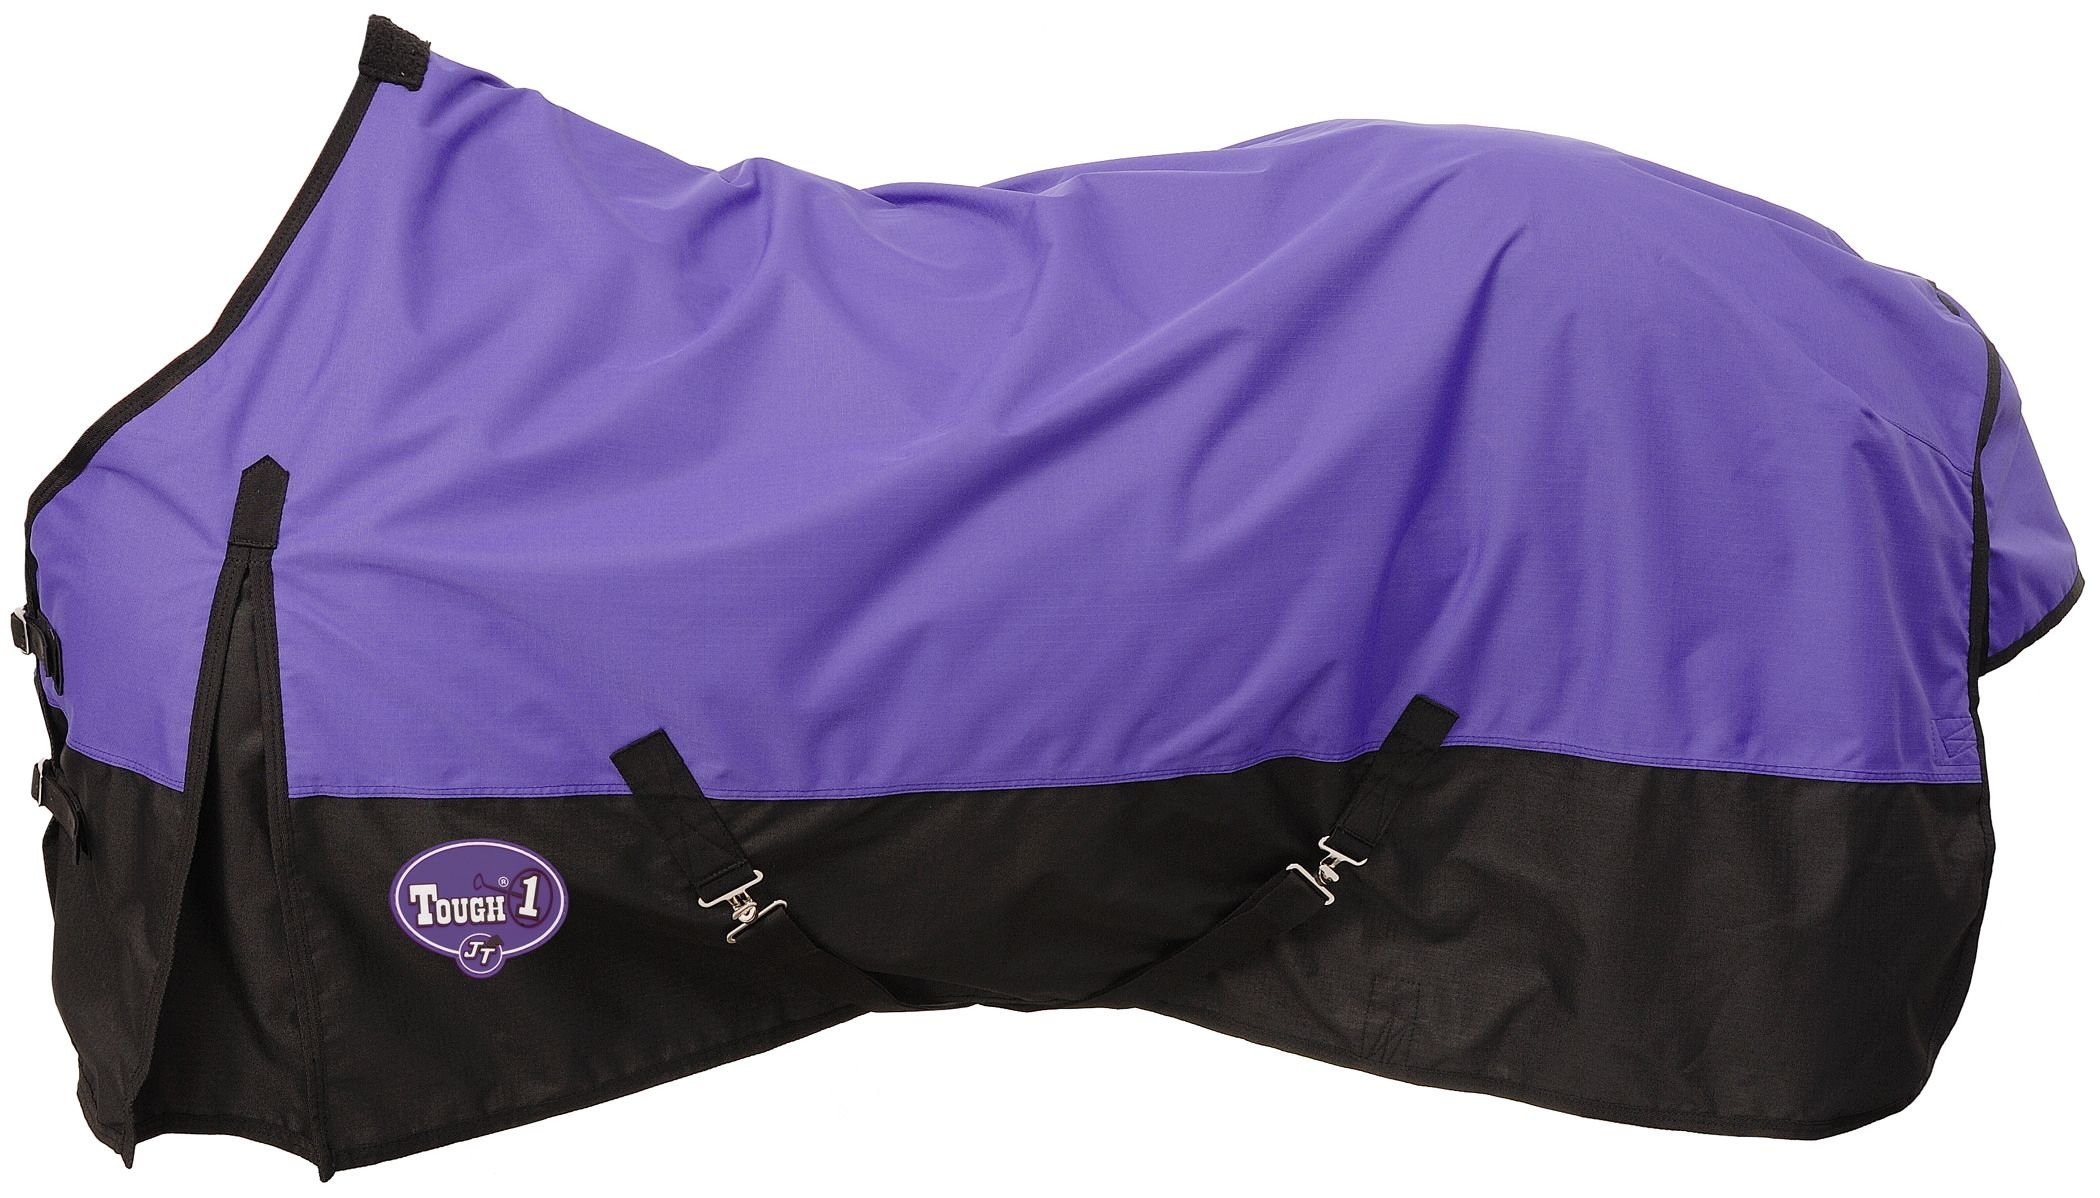 Tough 1 600 Denier Waterproof Horse Sheet, Purple, 72-Inch